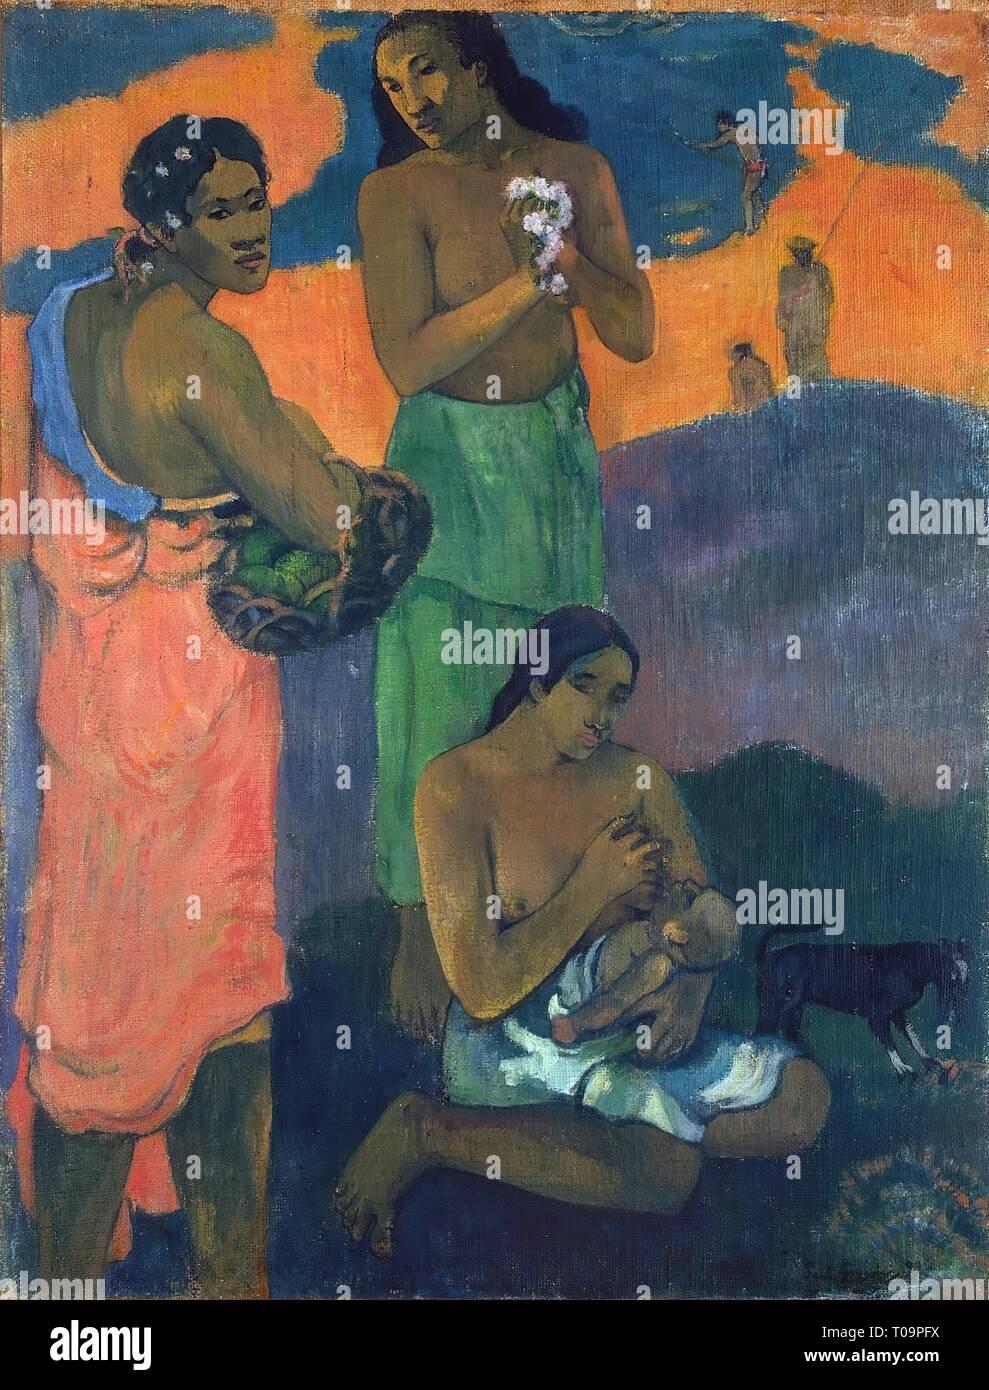 'Women on the Seashore (Motherhood)'. France, 1899. Dimensions: 95,5x73,5 cm. Museum: State Hermitage, St. Petersburg. Author: PAUL GAUGUIN . PAUL GAUGUIN. Paul Eugéne Henri Gauguin. - Stock Image